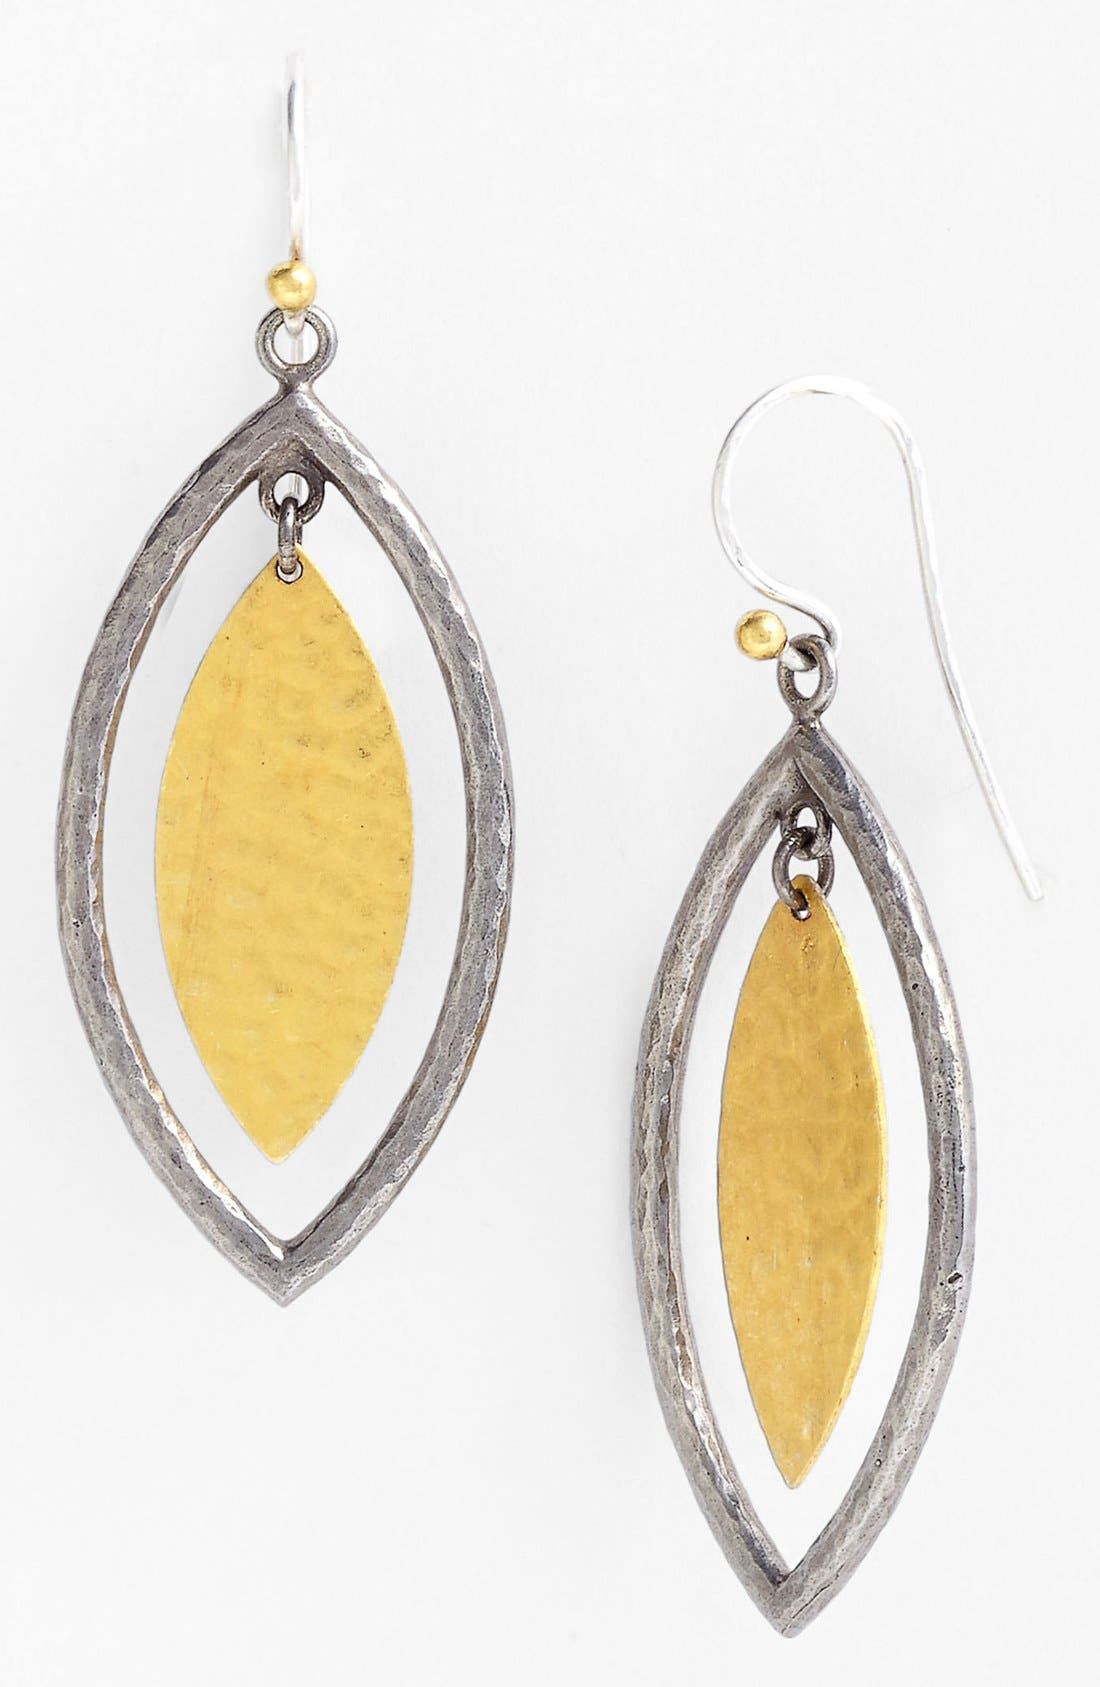 Main Image - Gurhan 'Willow' Blackened Silver & Gold Earrings